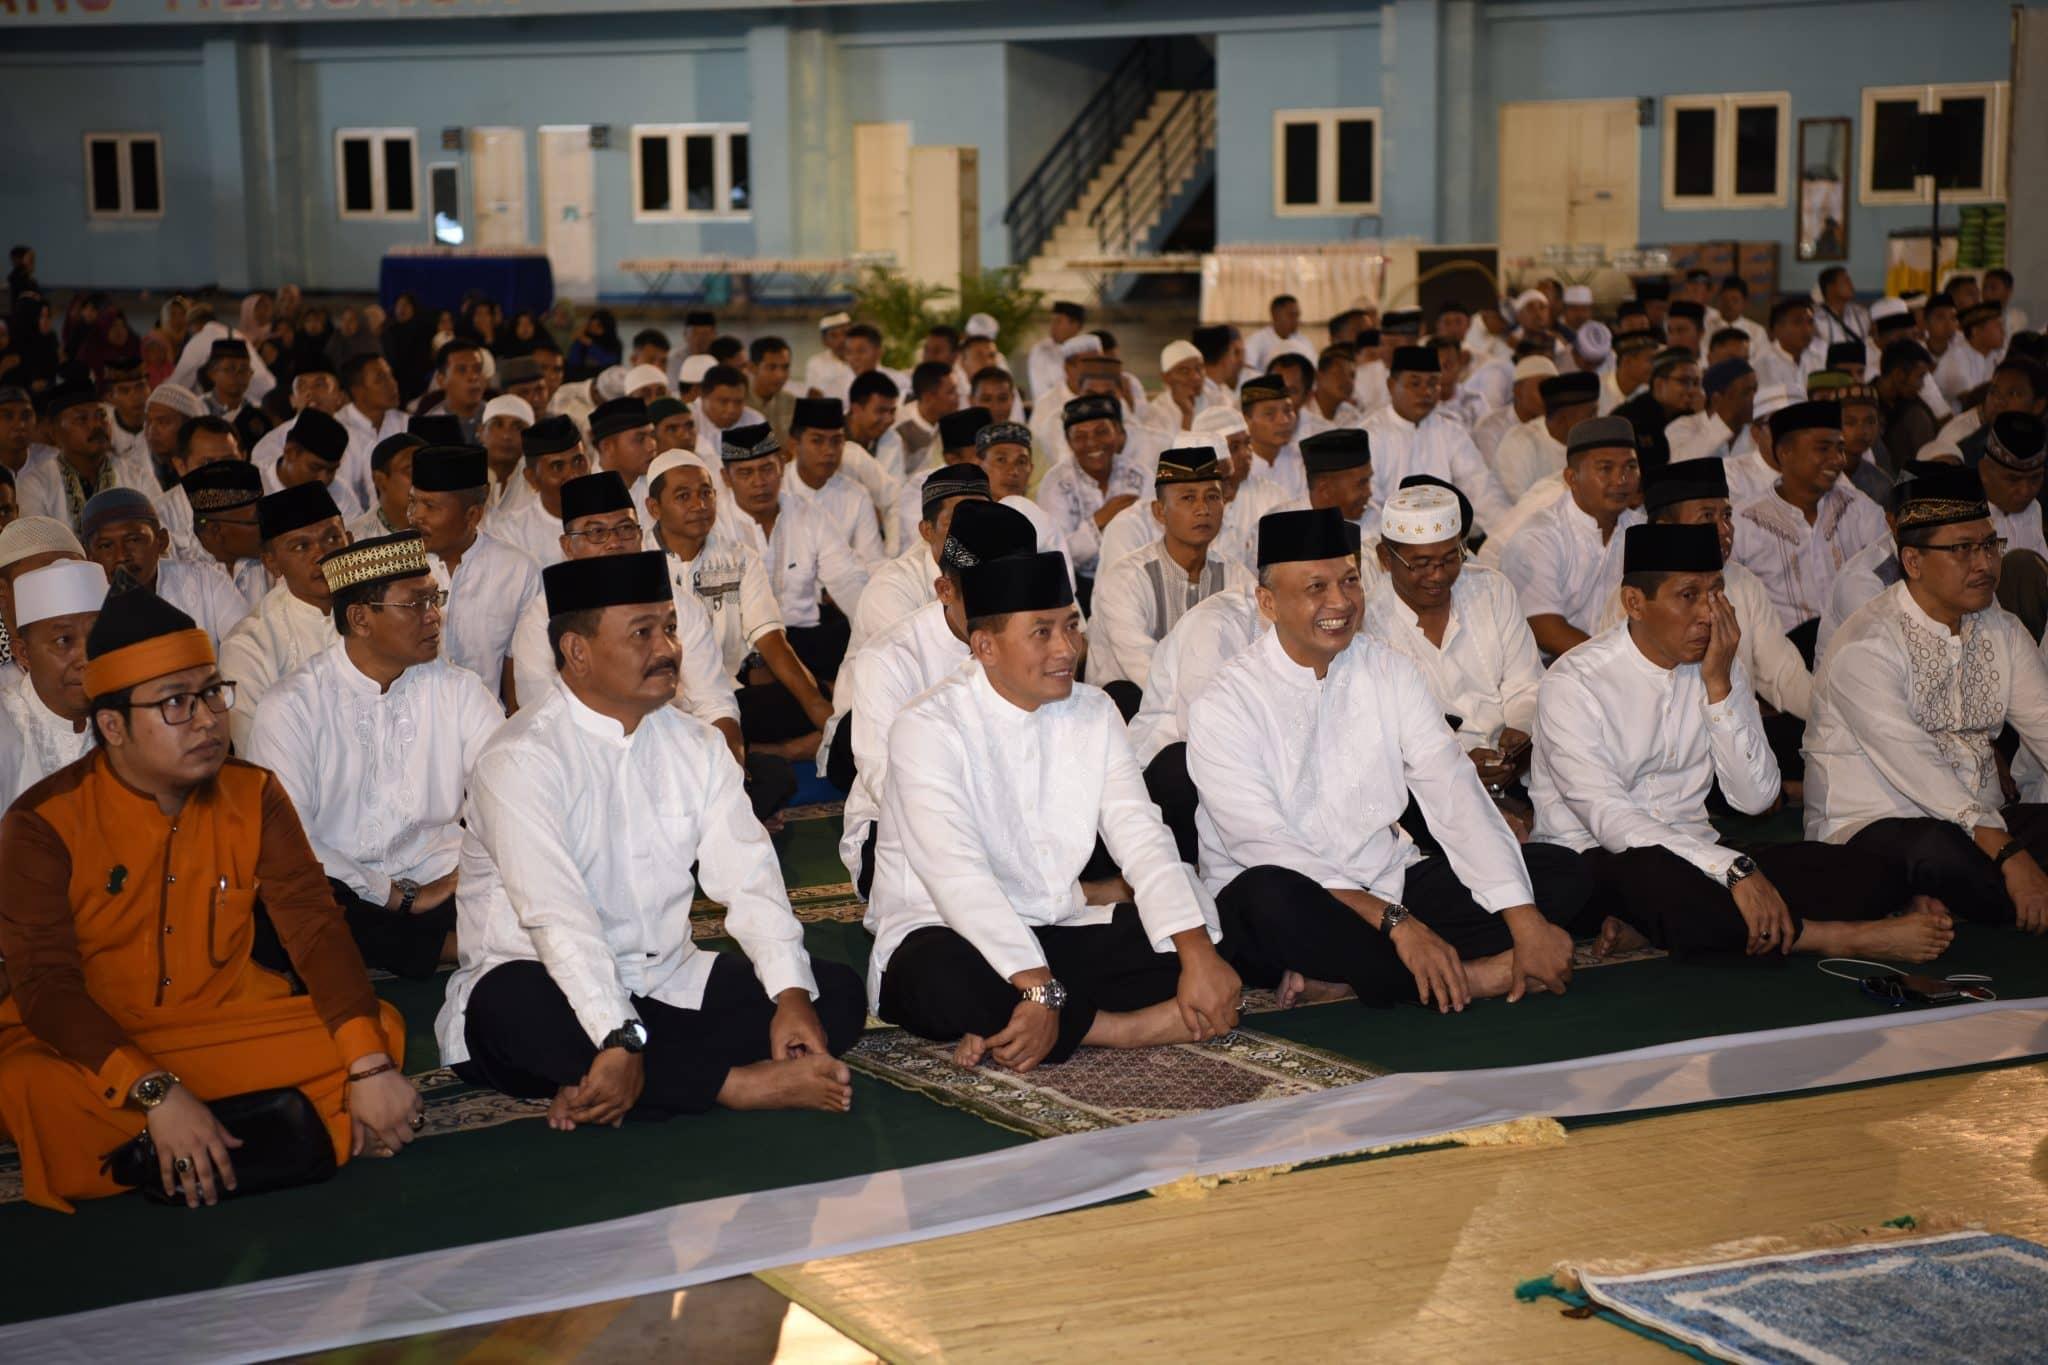 Kasau Buka Puasa Bersama Ratusan Anak Yatim Di Lanud Sultan Hasanuddin